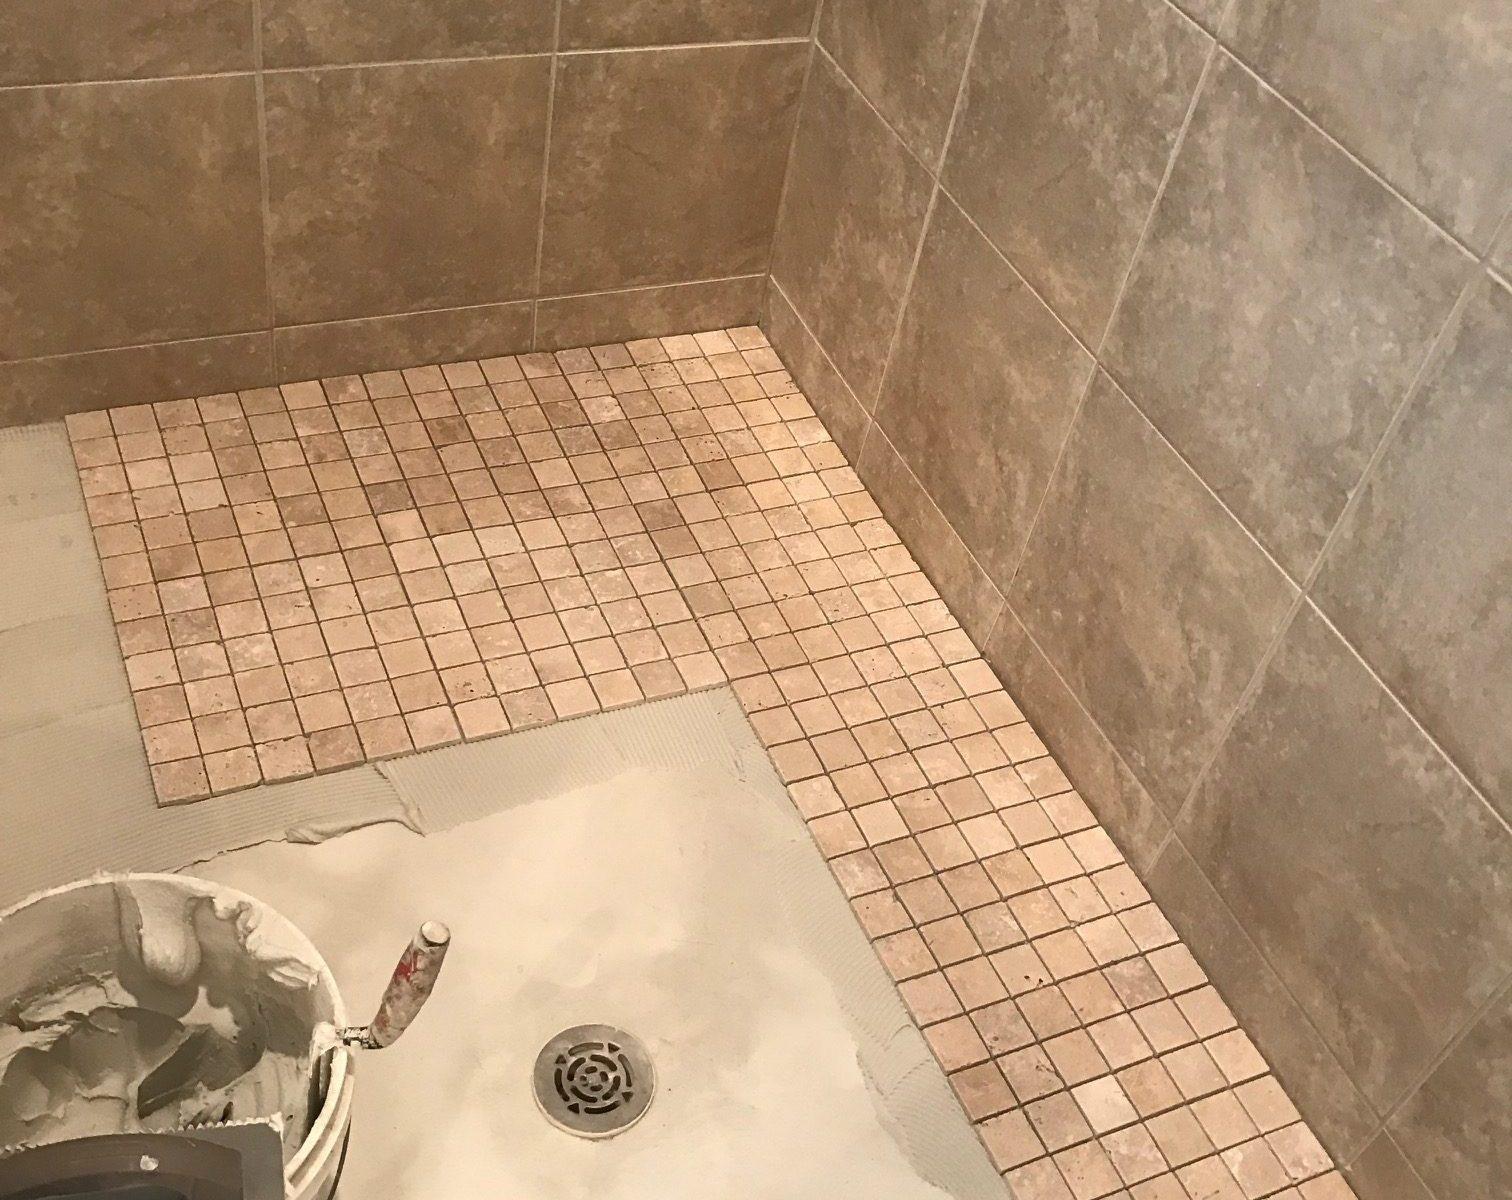 Retiling Shower Floor Closings And Car Seats